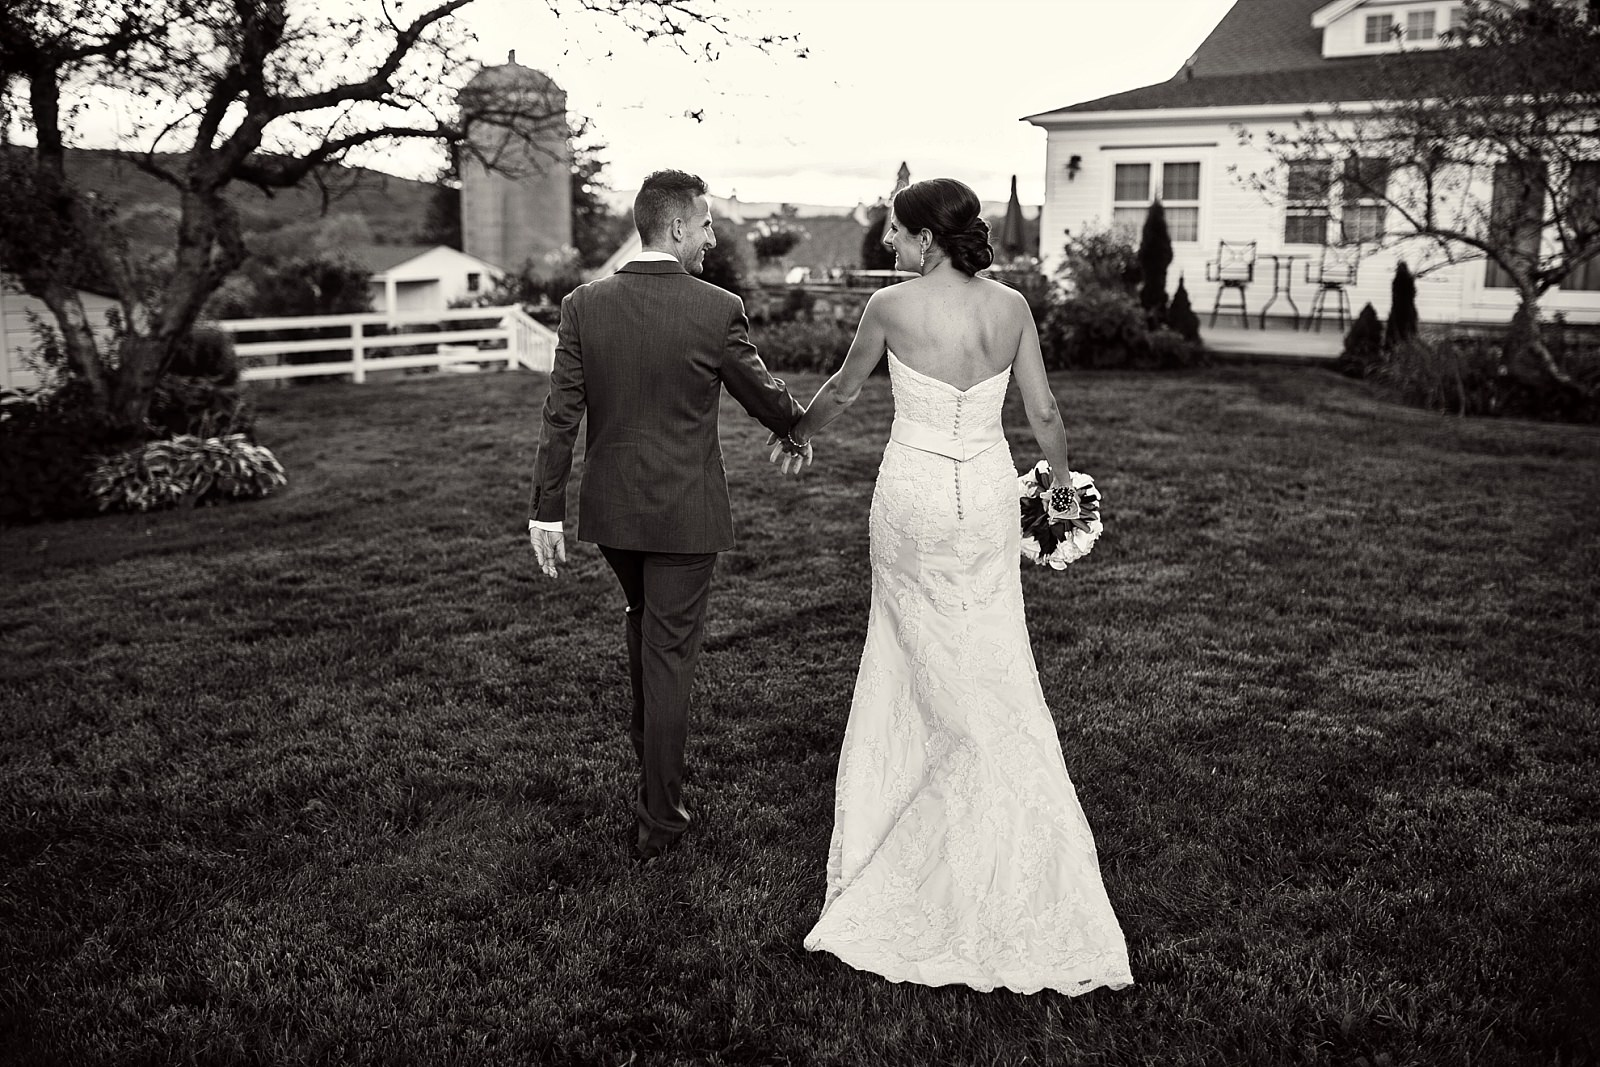 CT_Wedding_Photographer_LiNa_Wed_60.jpg